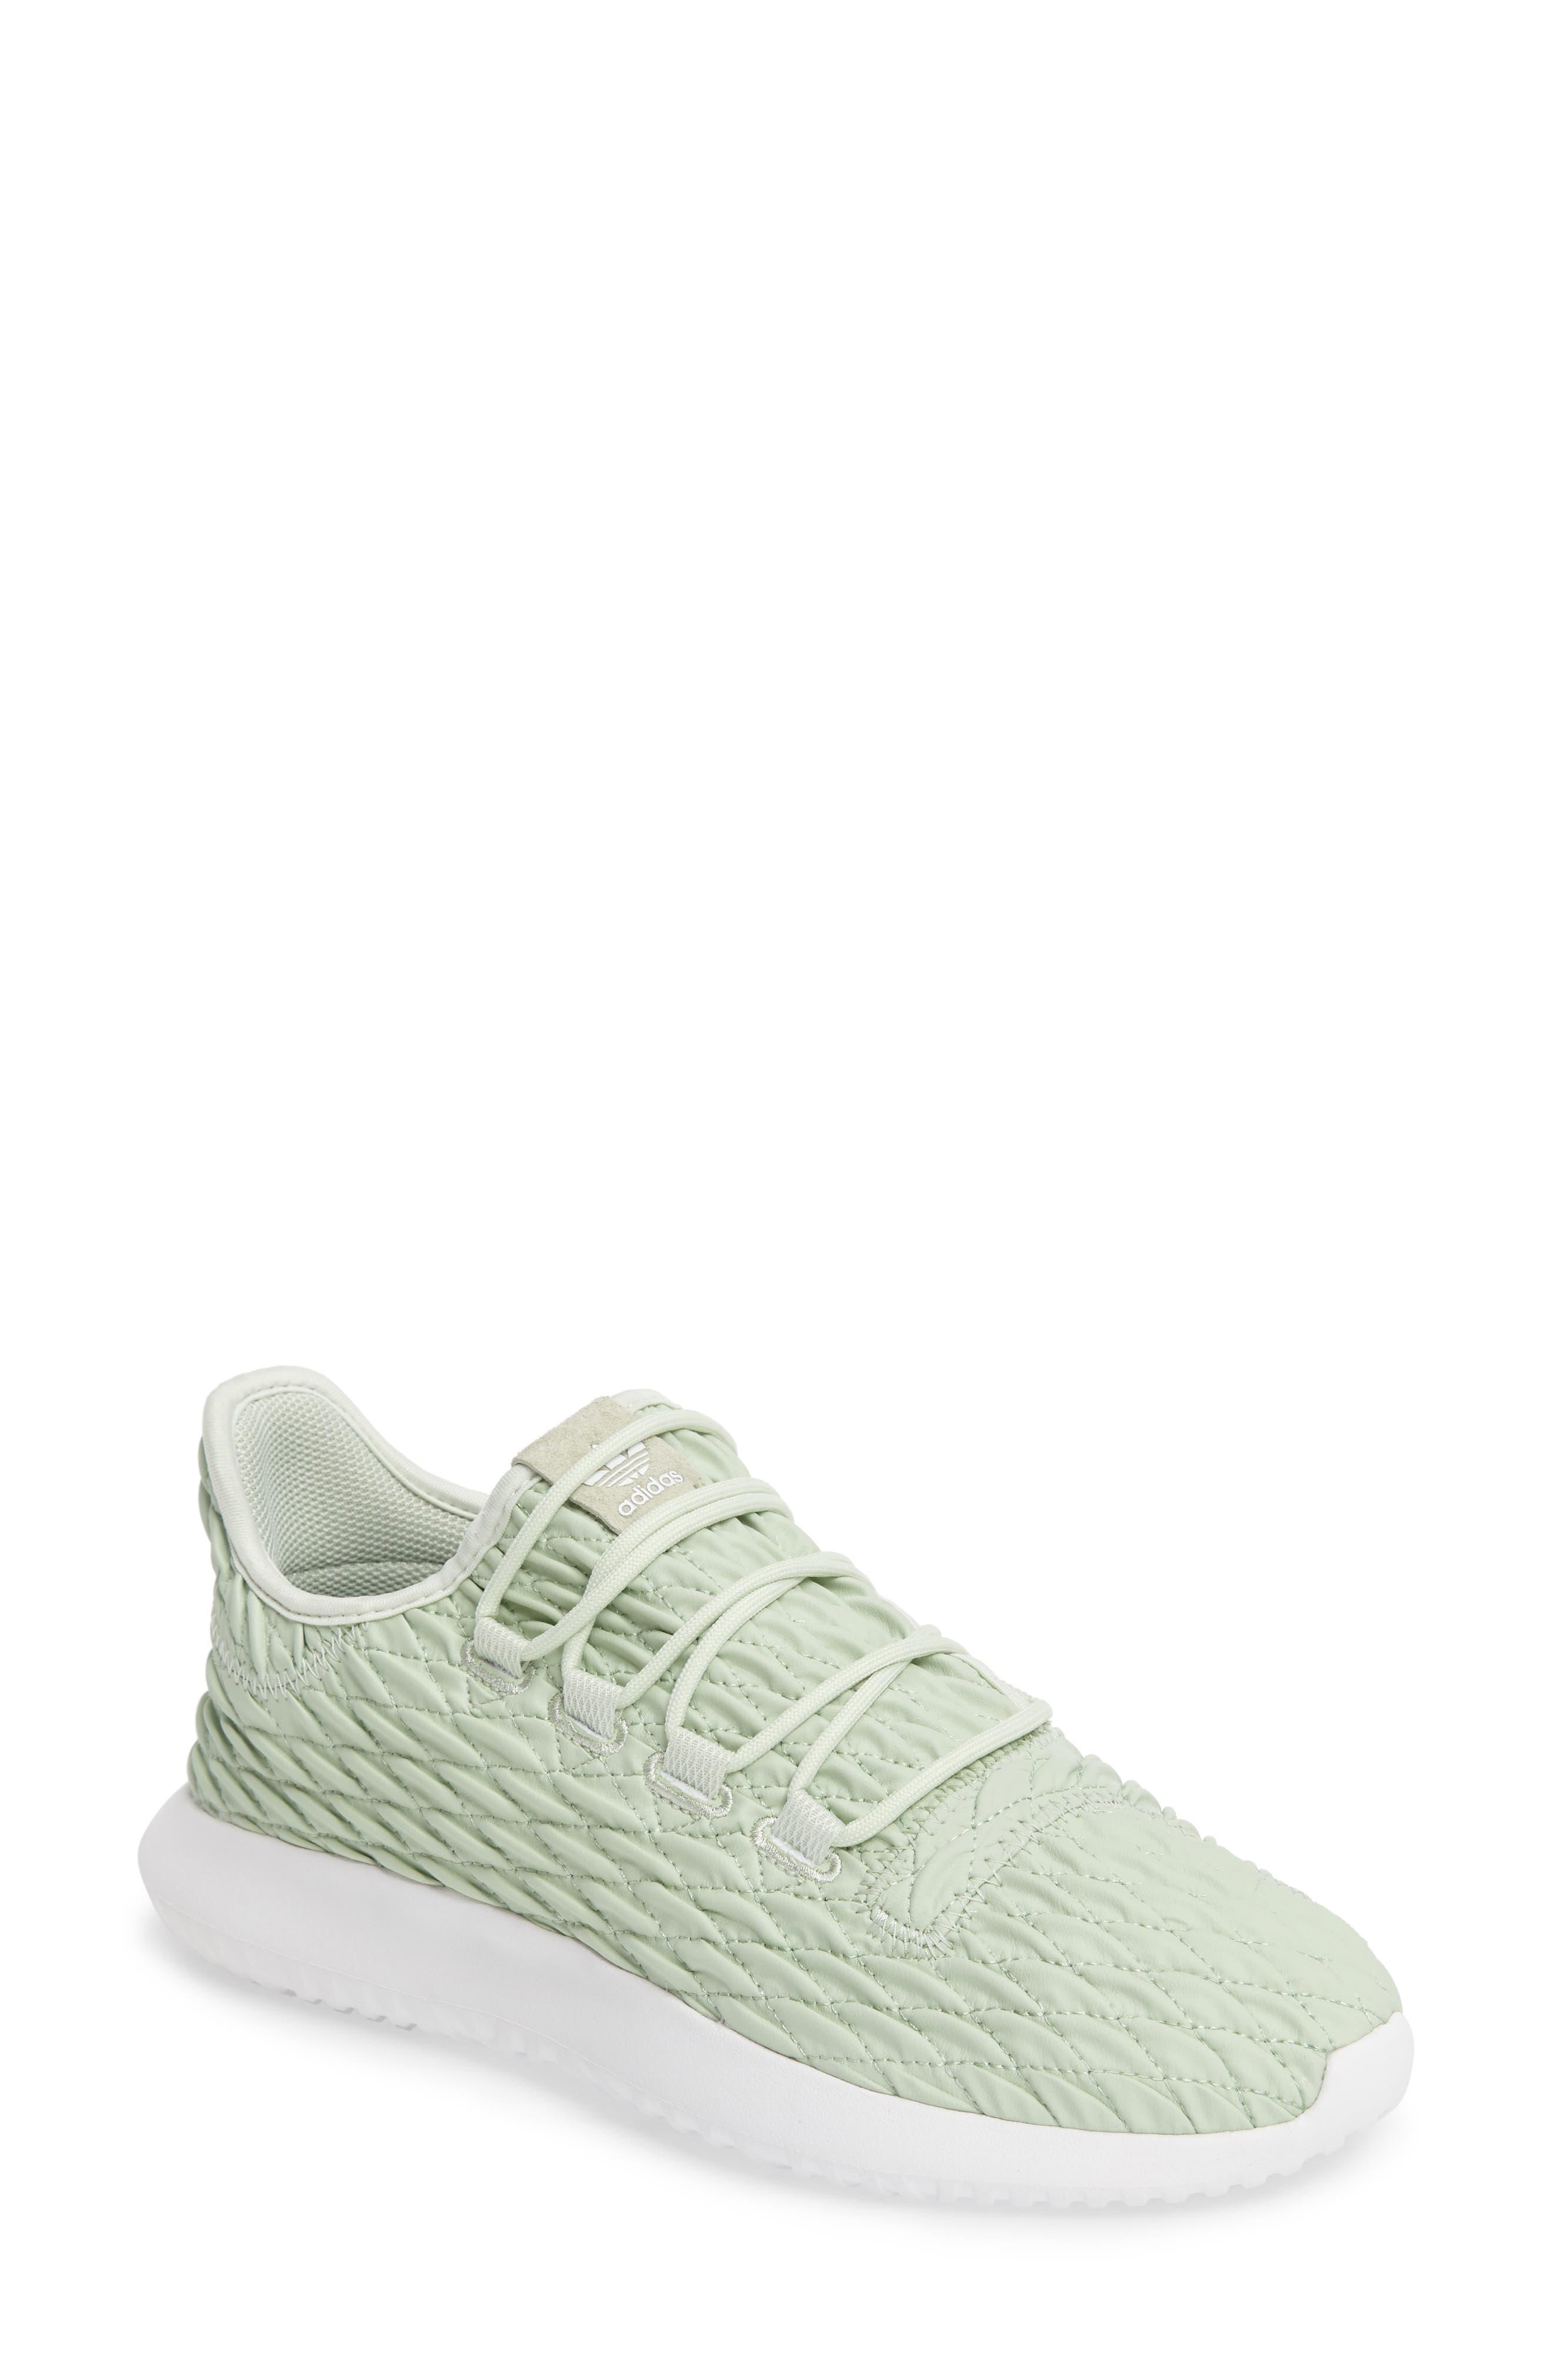 Alternate Image 1 Selected - adidas Tubular Shadow Sneaker (Women)